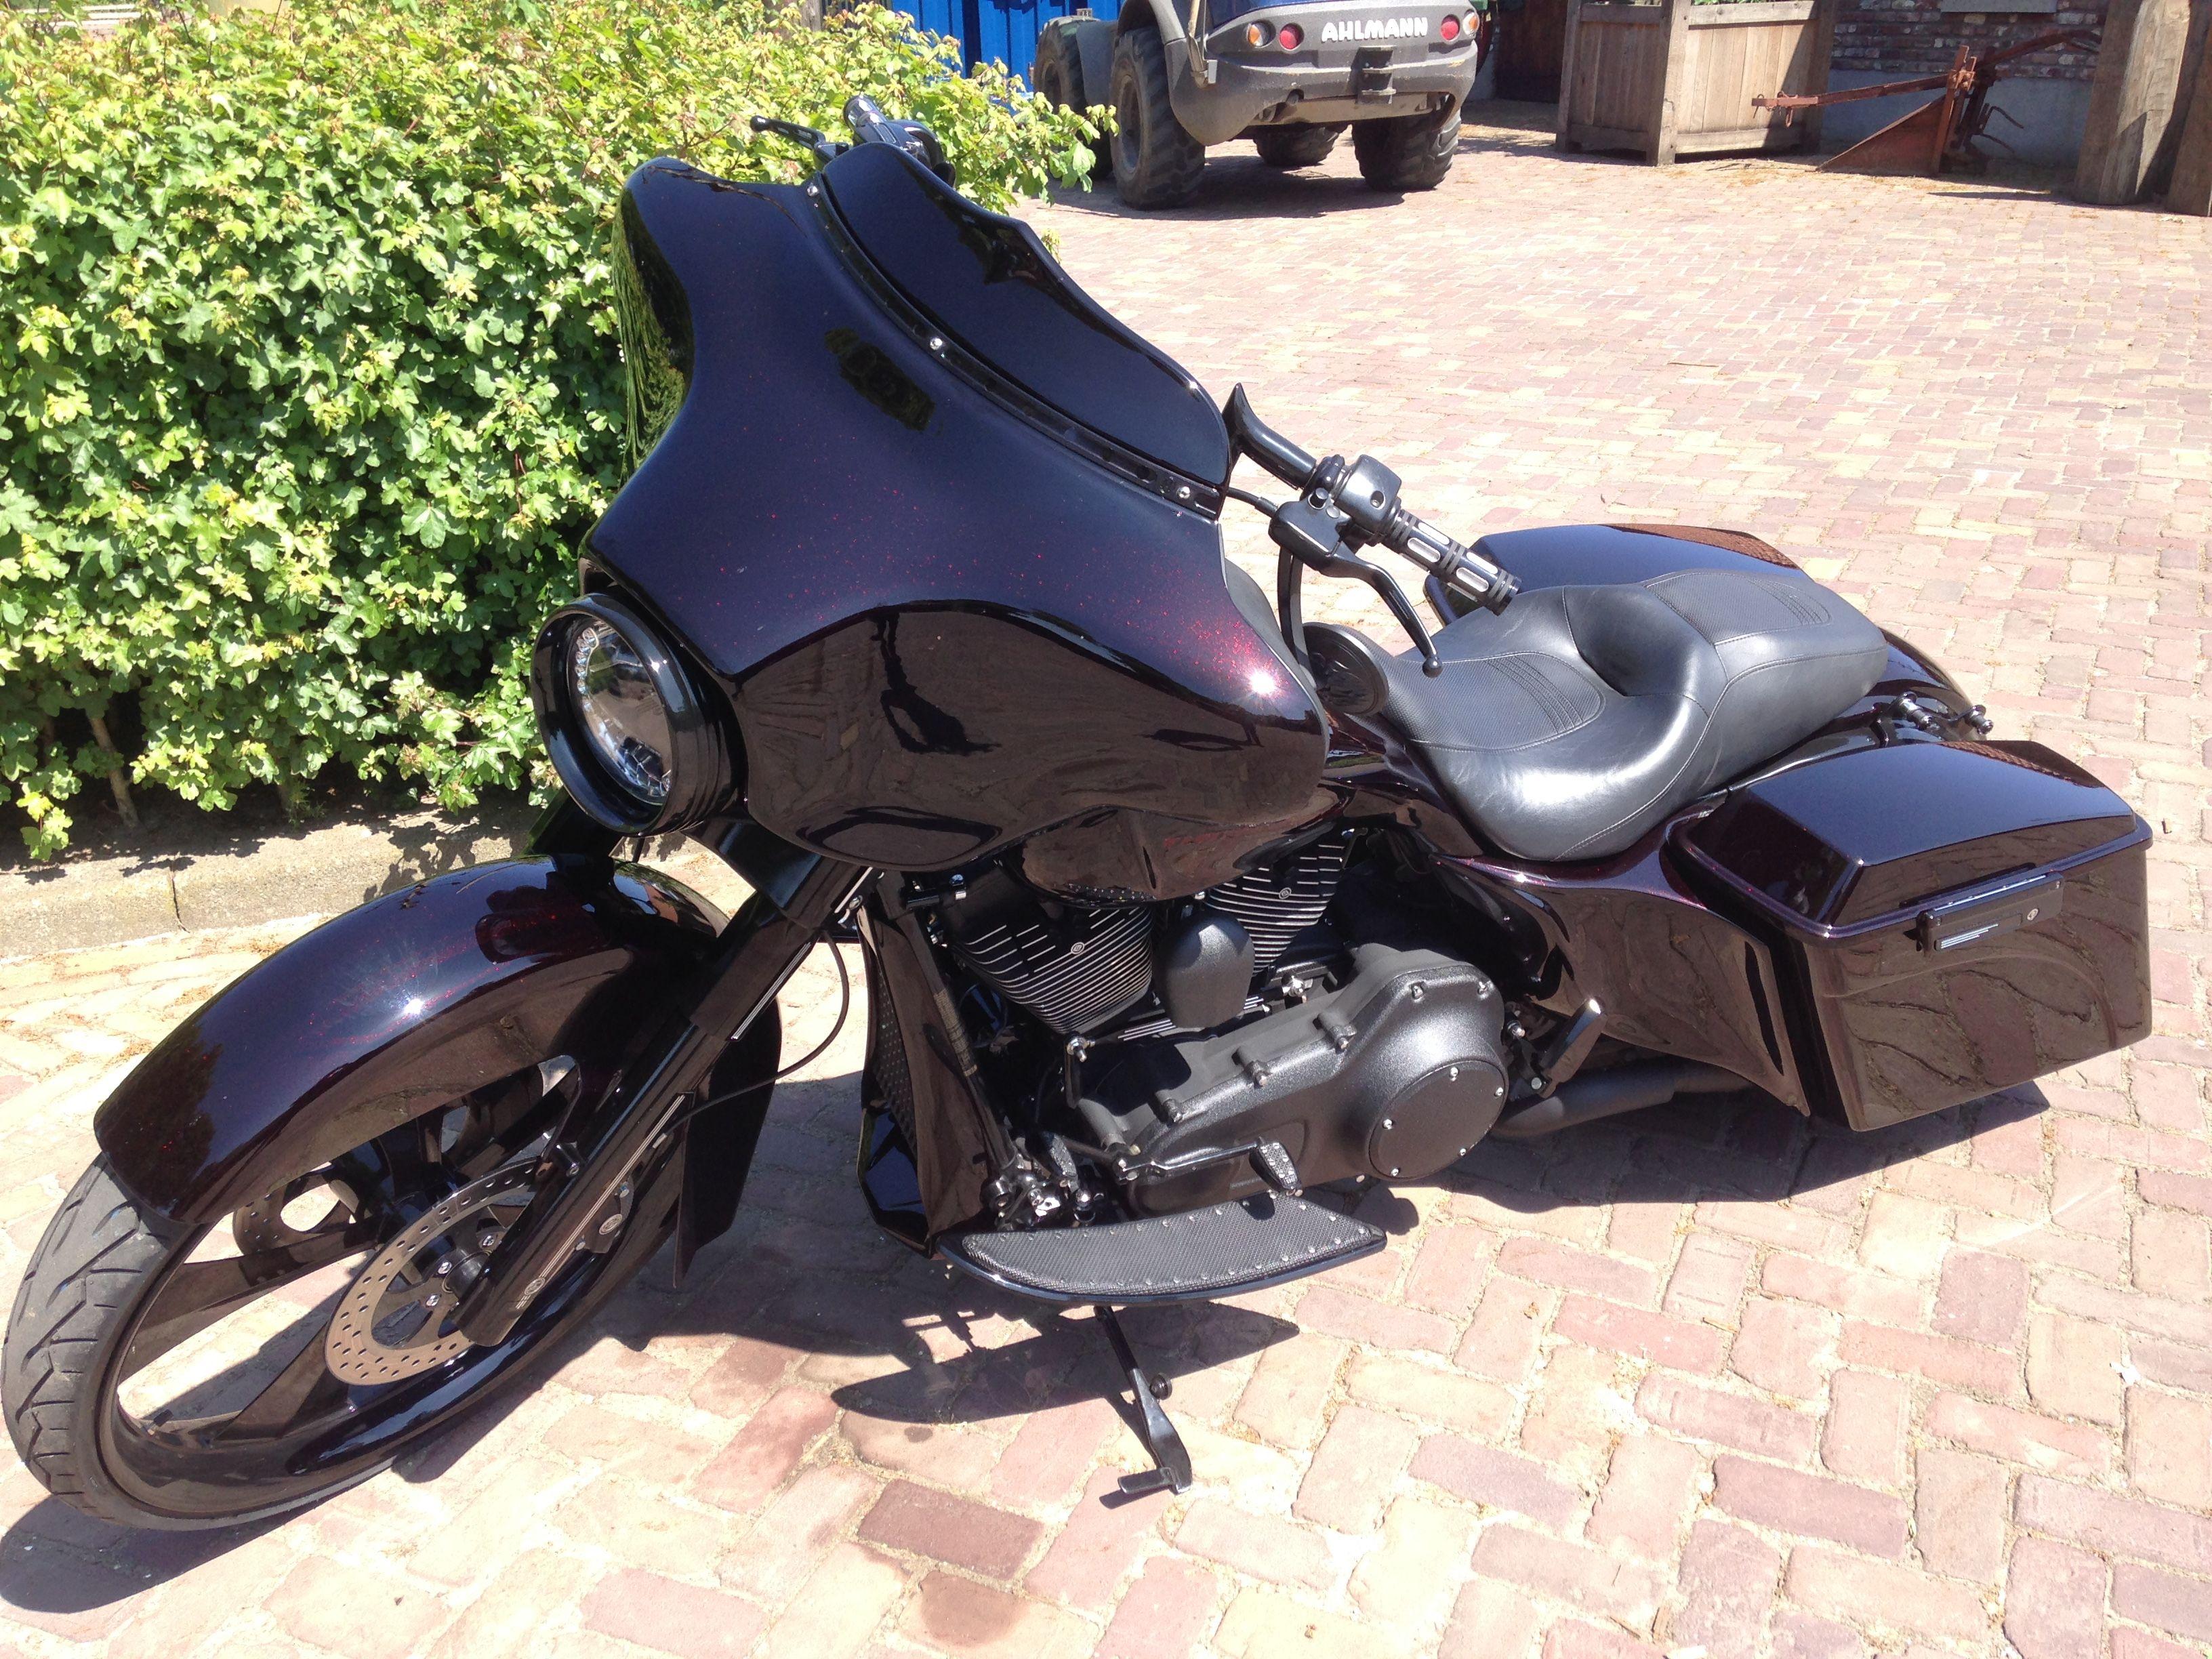 Te koop op marktplaats.nl http://www.marktplaats.nl/a/motoren/motoren-harley-davidson/m916839921-harley-davidson-street-glide-2009-flhx-bagger.html?c=8c285449651fa109c354bbabe740c1b&previousPage=lr